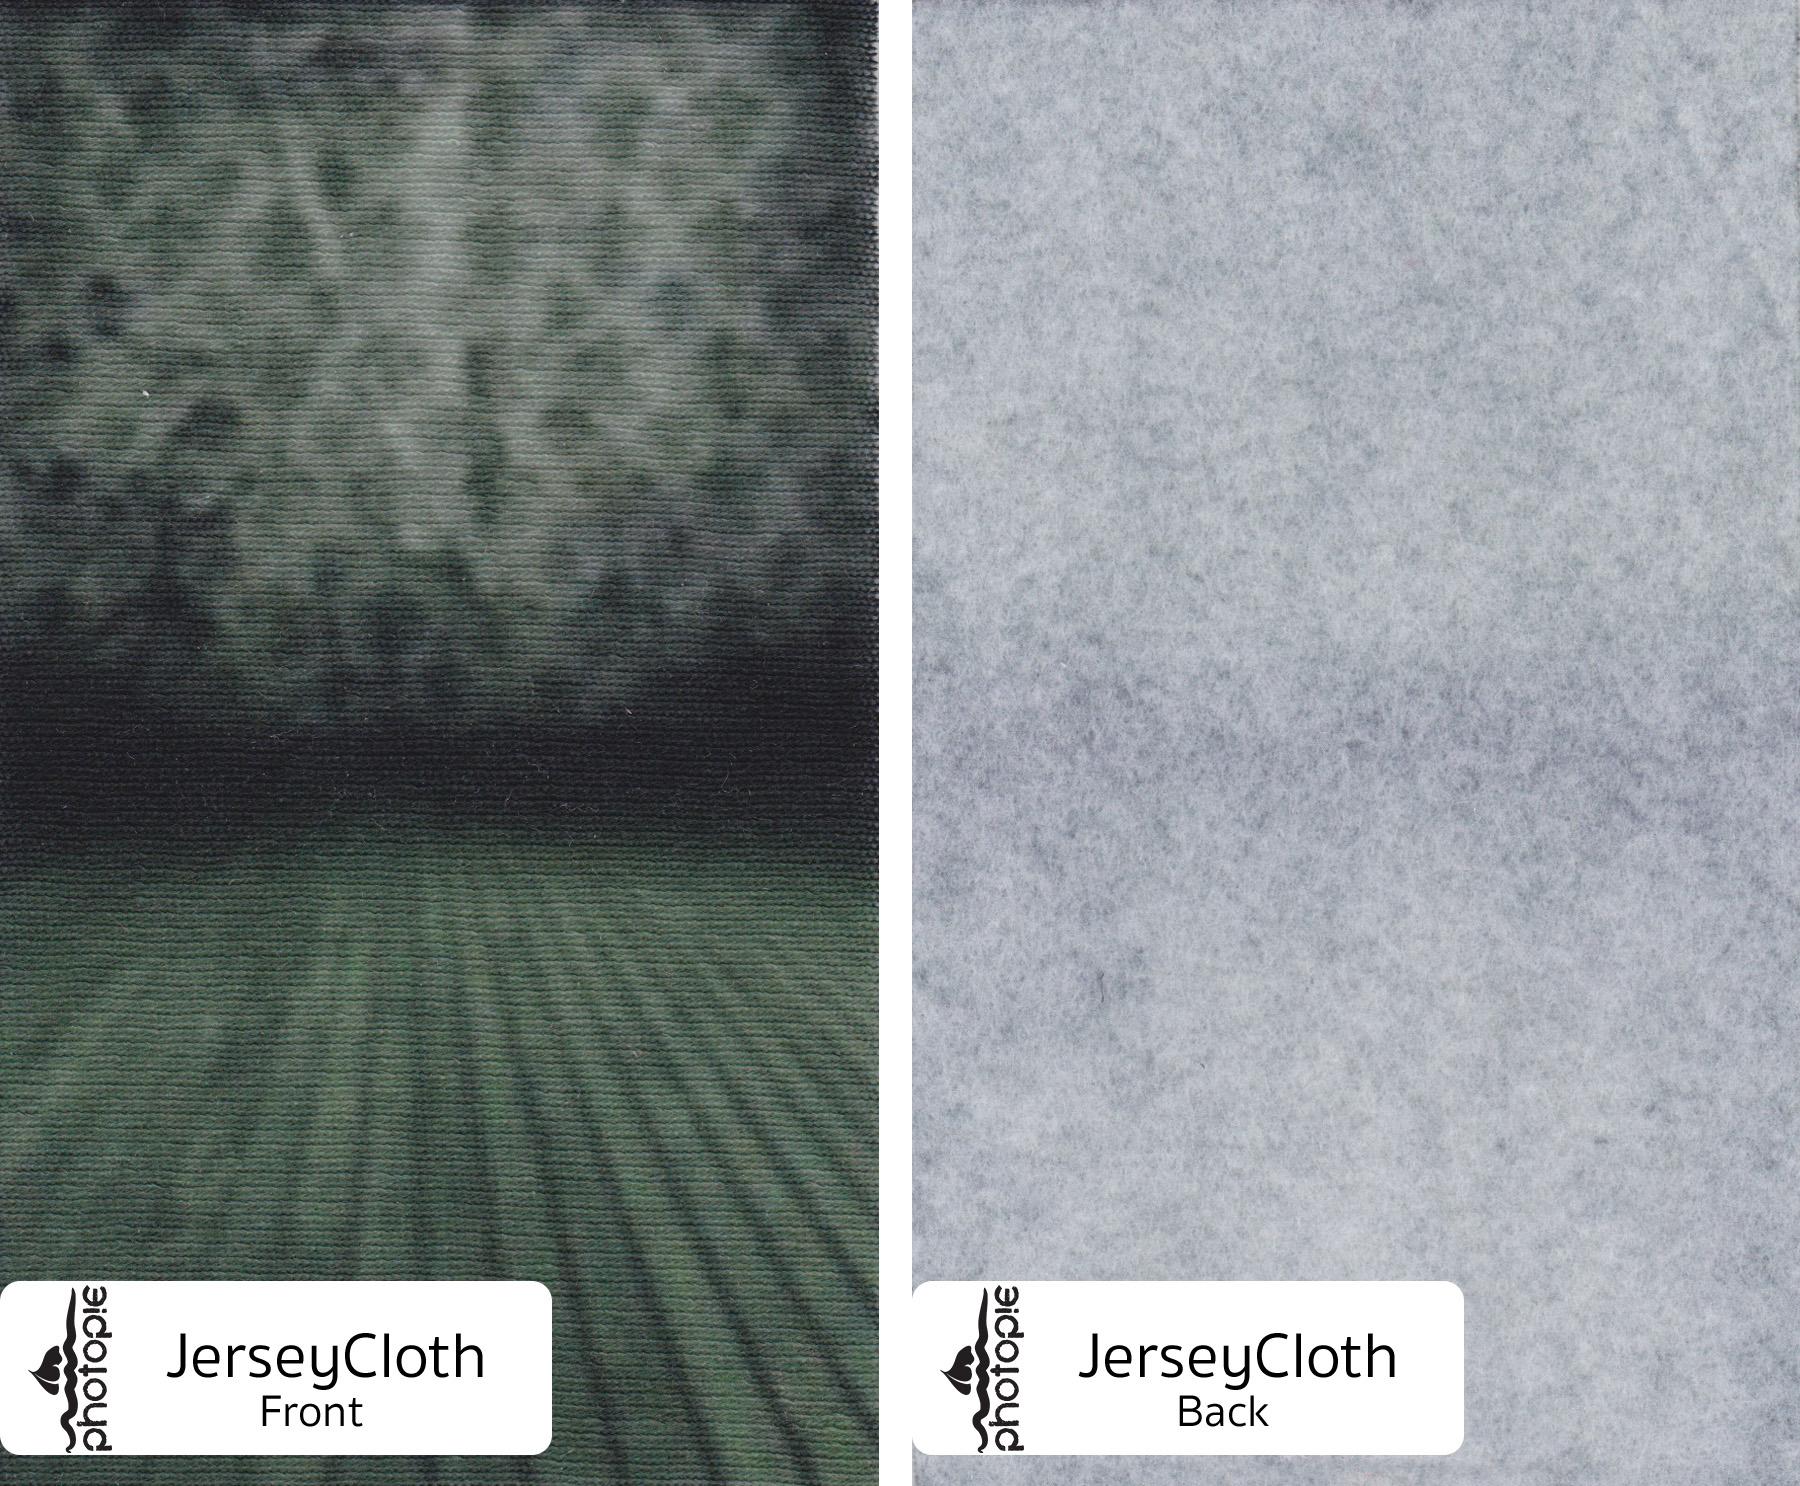 jerseyclothlg3.jpg